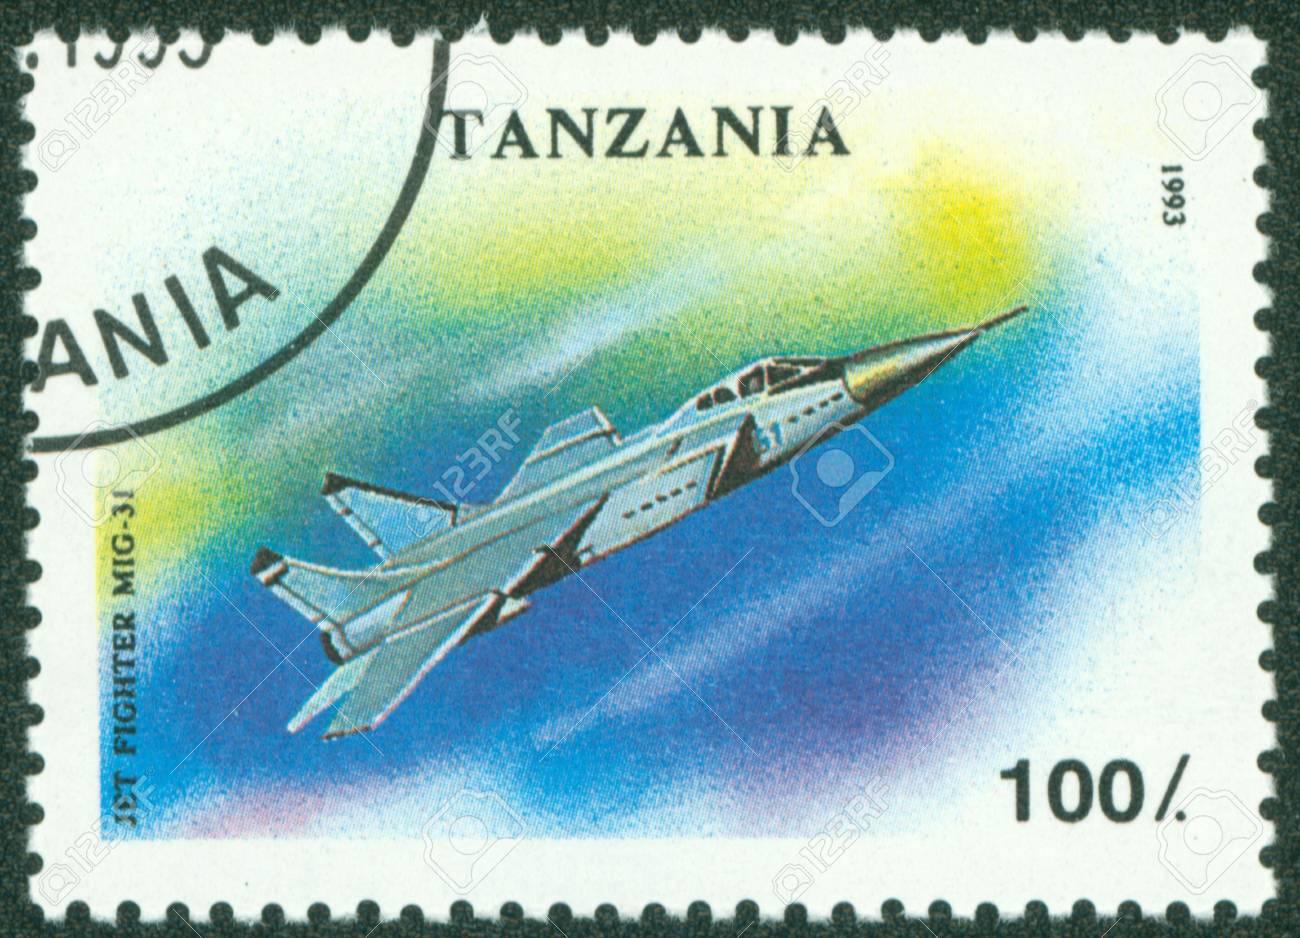 TANZANIA - CIRCA 1993  A stamp printed in Tanzania shows jet fighter MIG-31, circa 1993 Stock Photo - 16320947